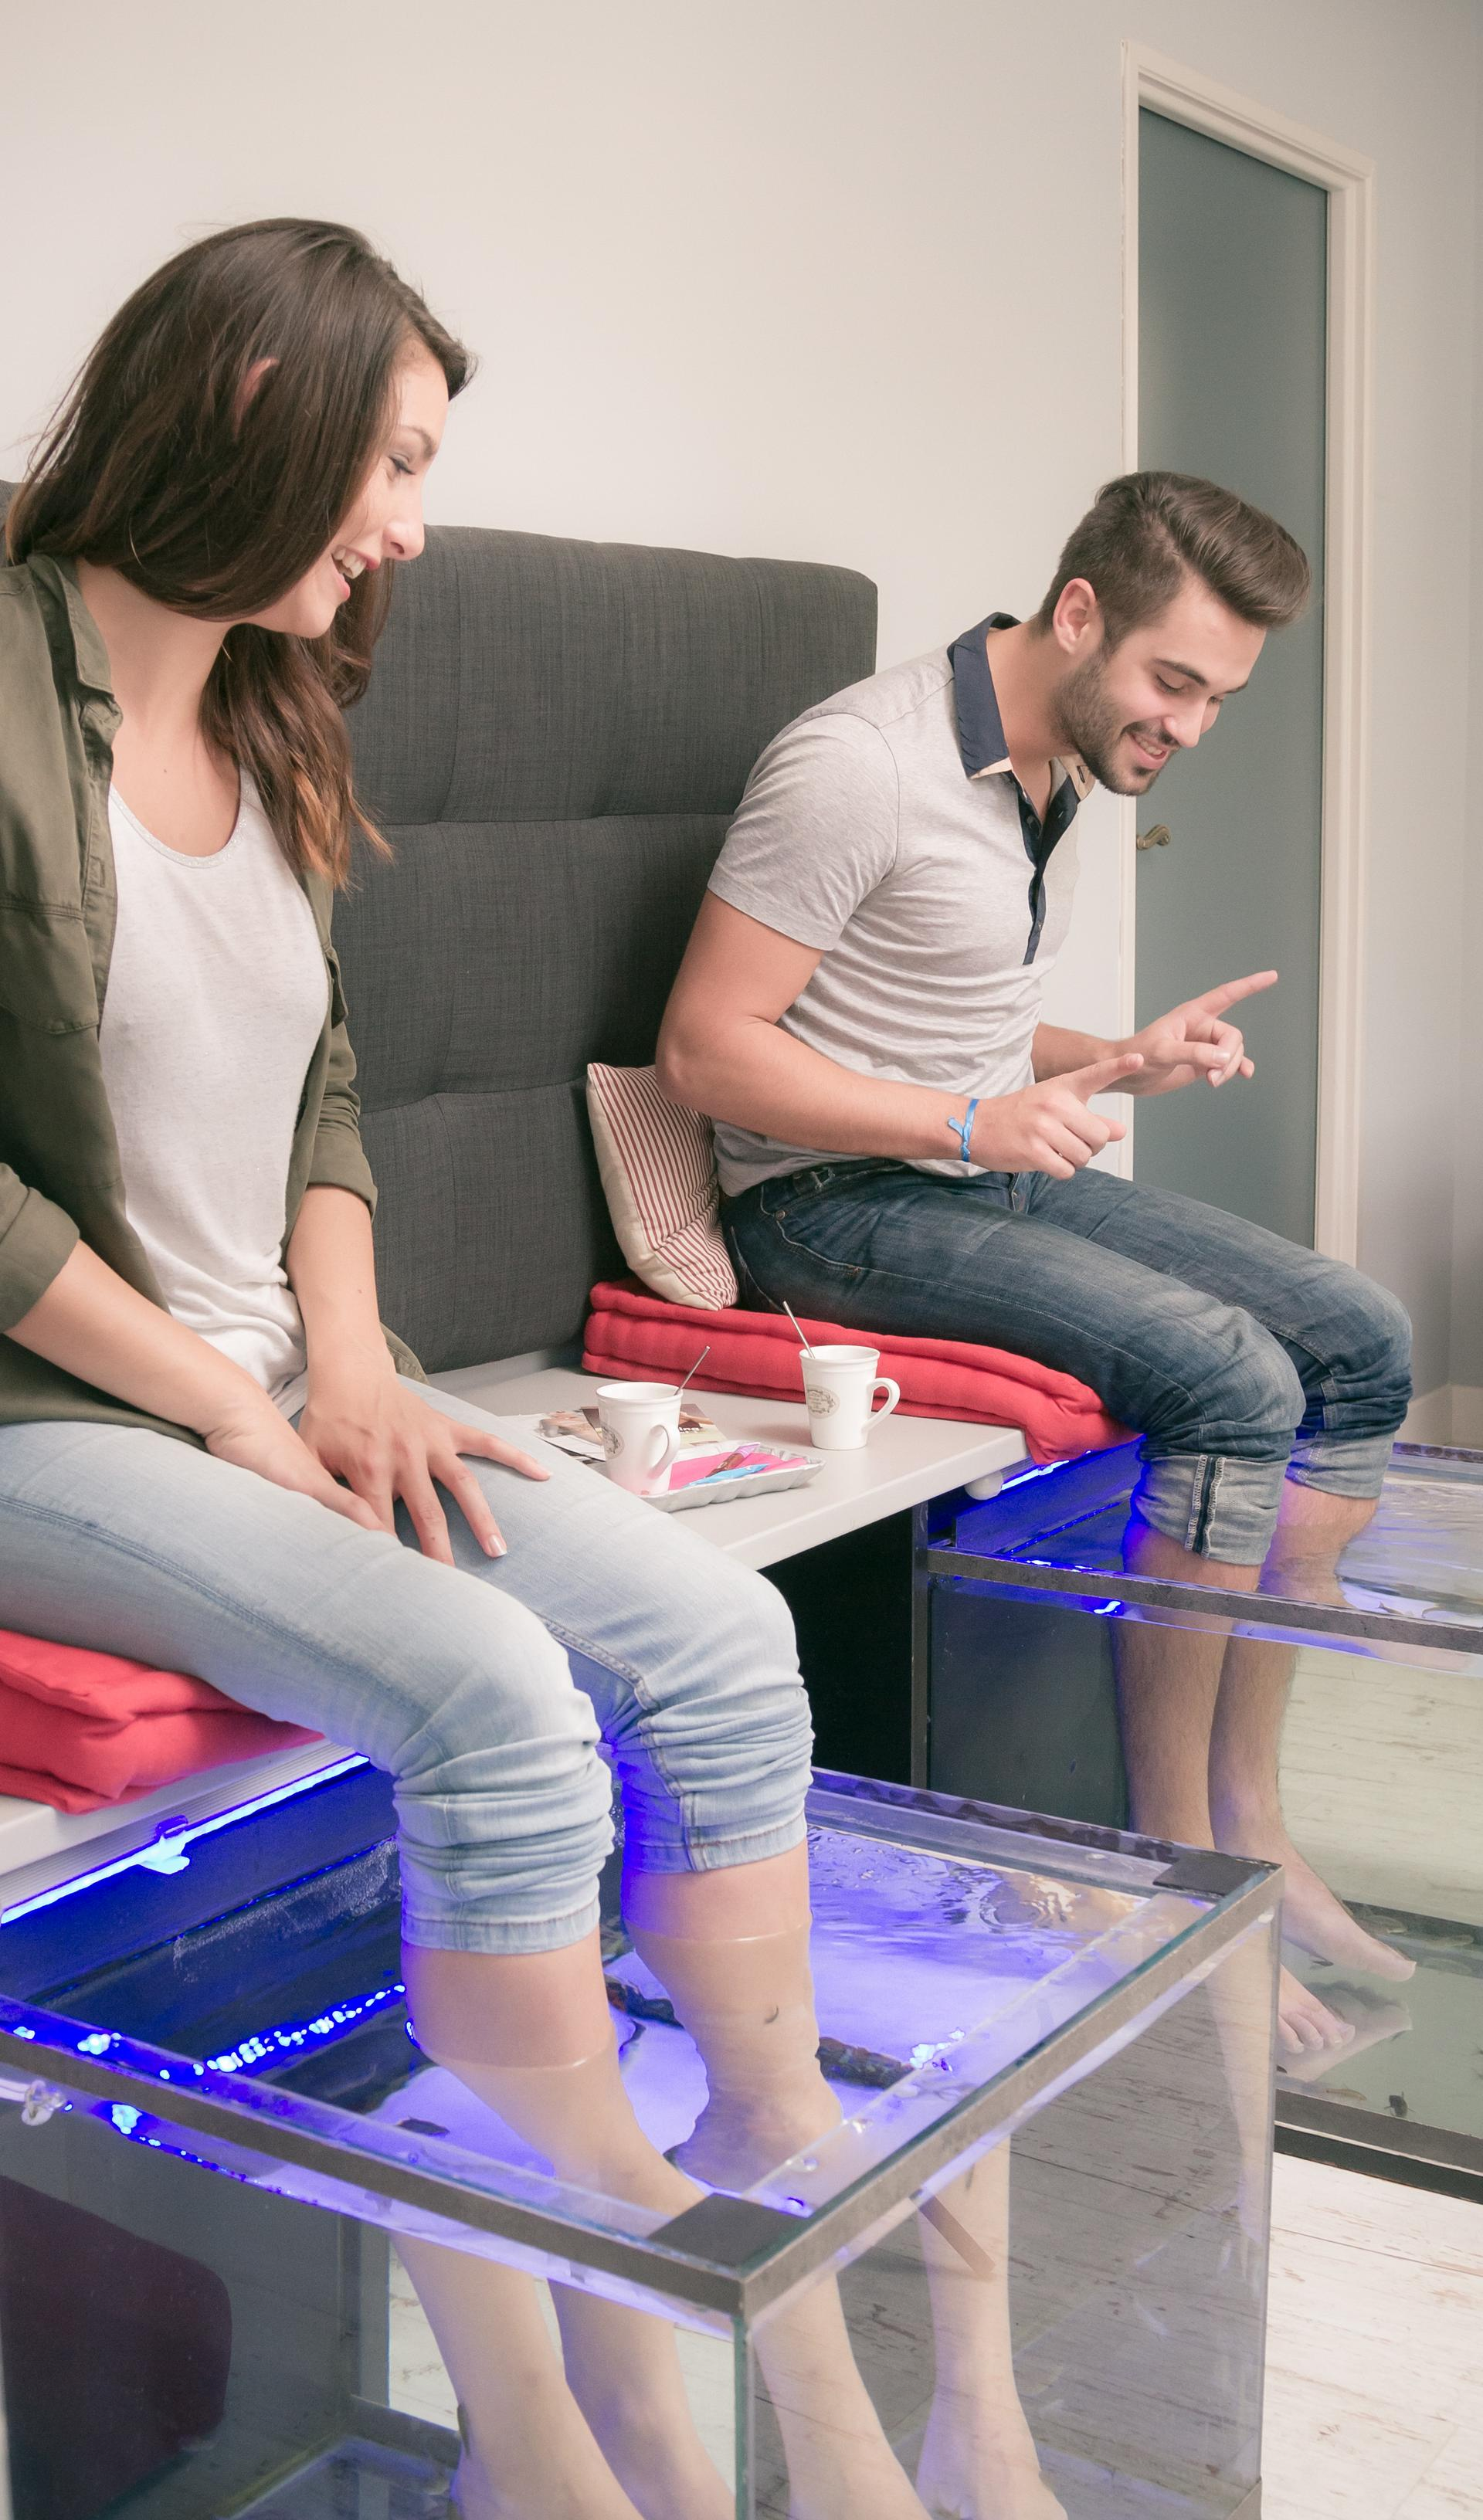 fish spa la s ance de 25 mn modelage des pieds en duo. Black Bedroom Furniture Sets. Home Design Ideas